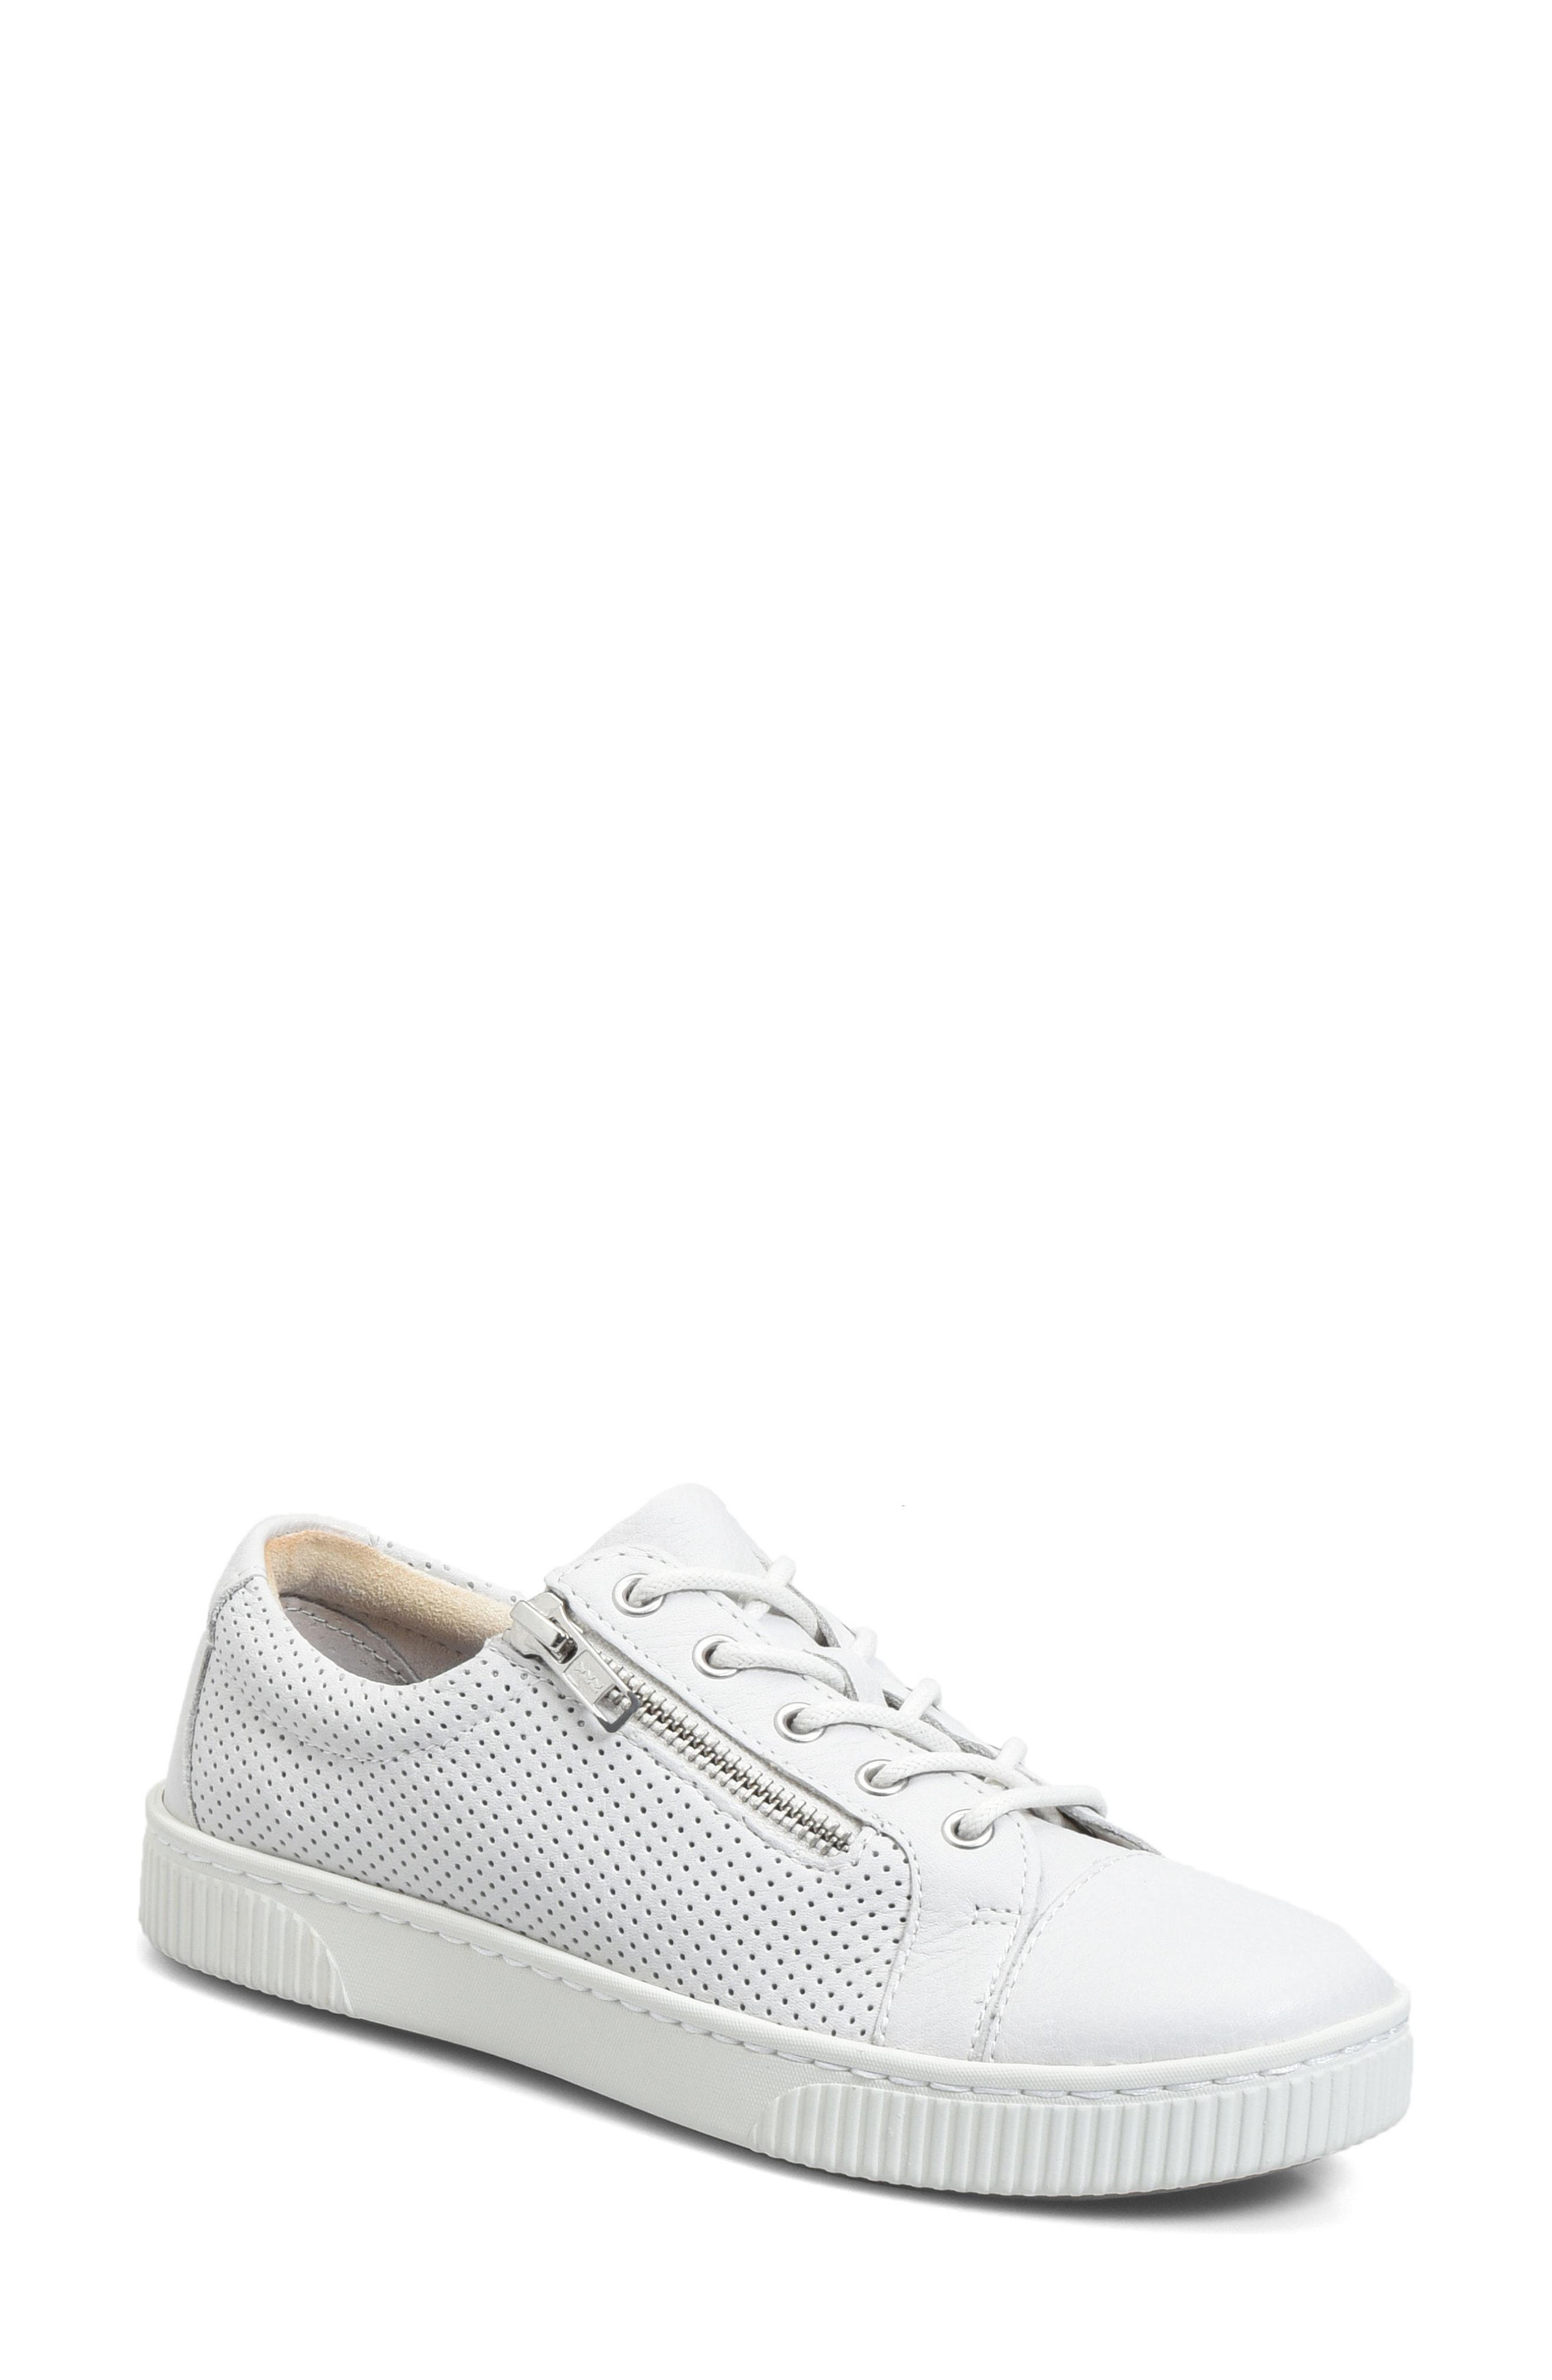 3d641a0ad7f Lyst - Born B rn Tamara Perforated Sneaker in White